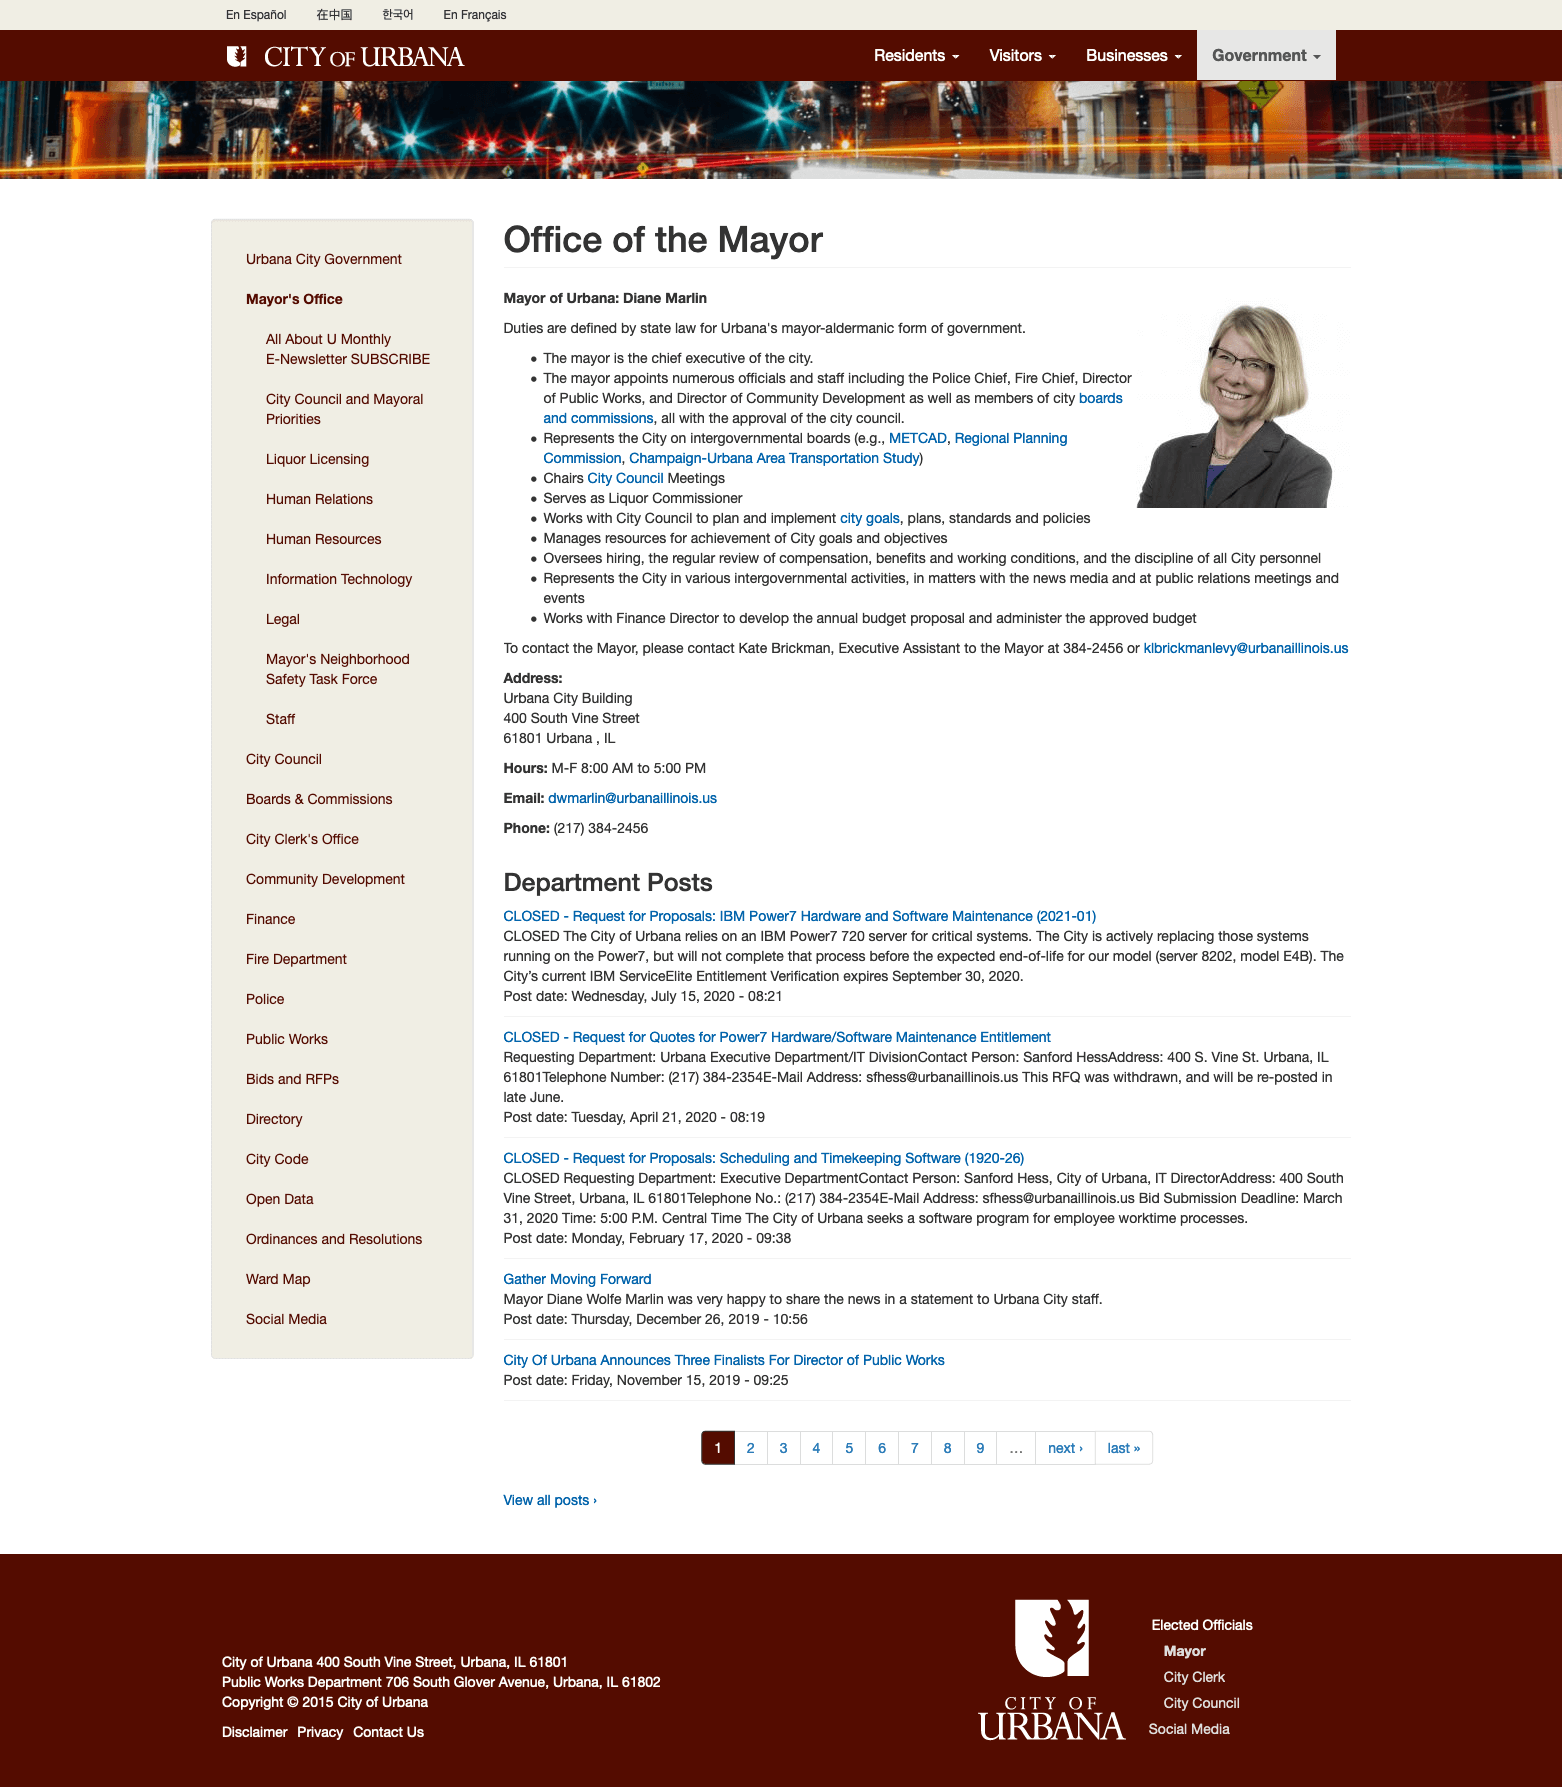 City of Urbana, Illinois - Website